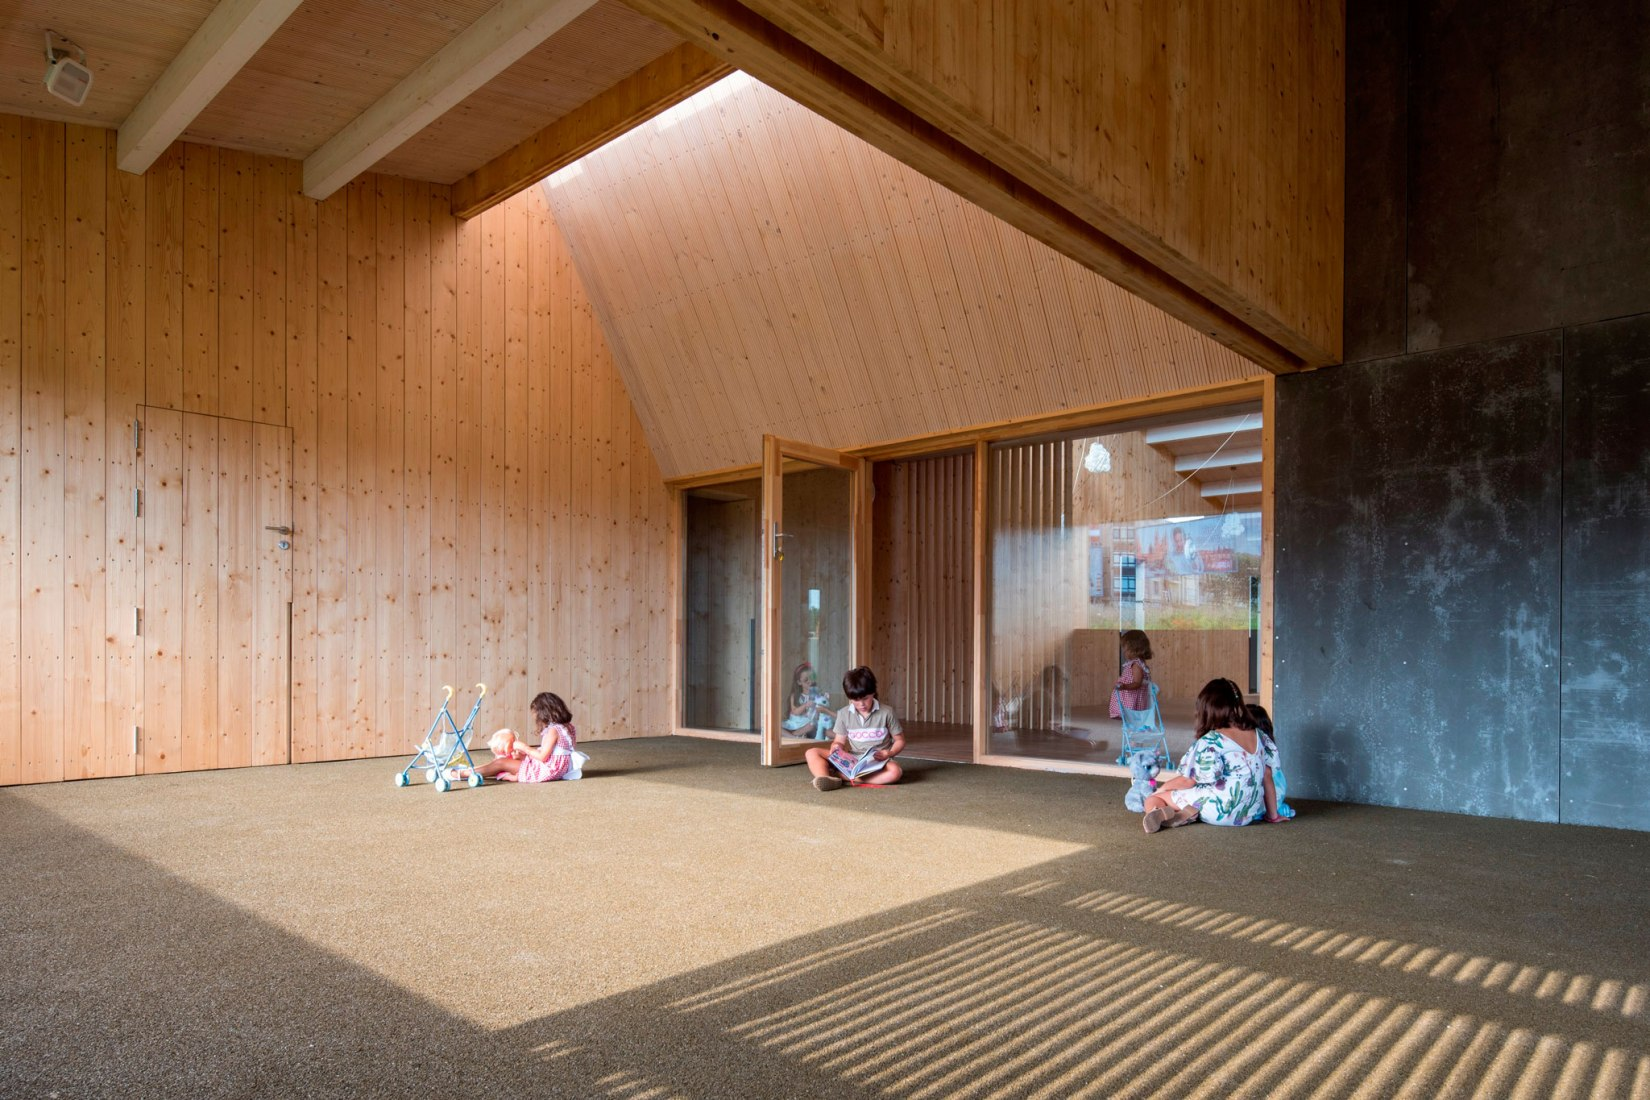 escuela construida con madera